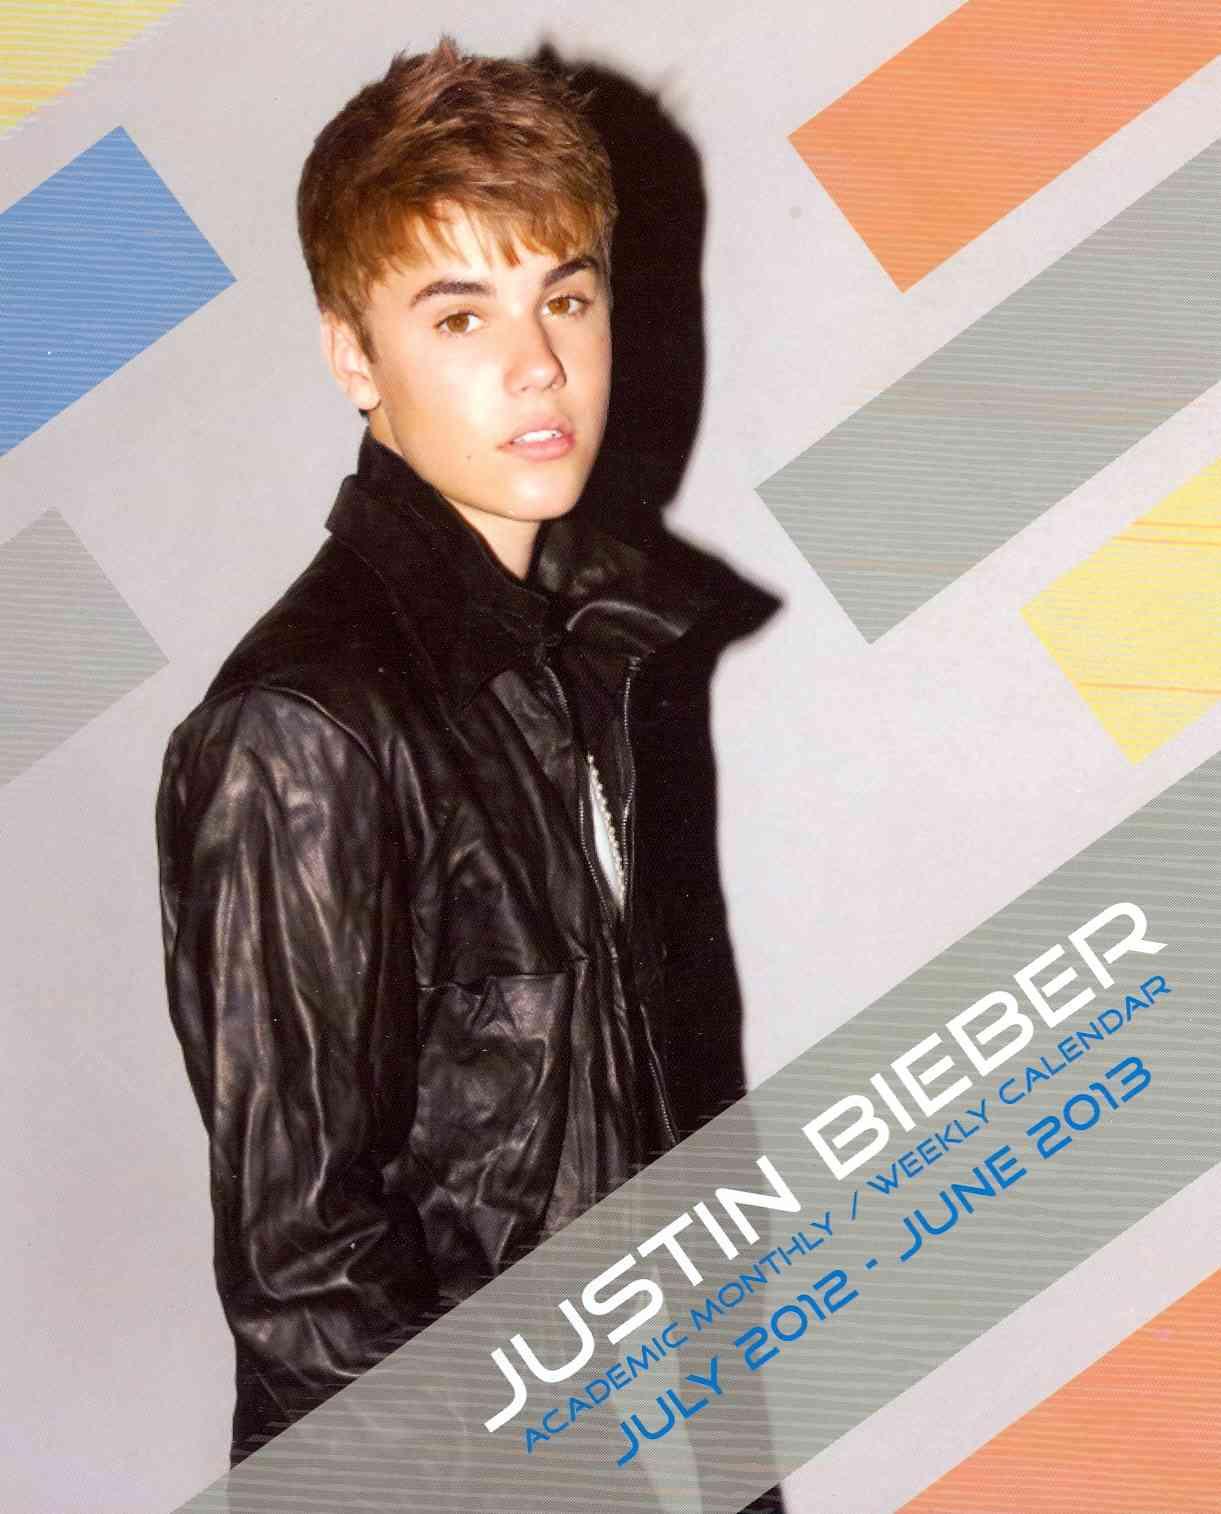 Justin Bieber Calendar 2013